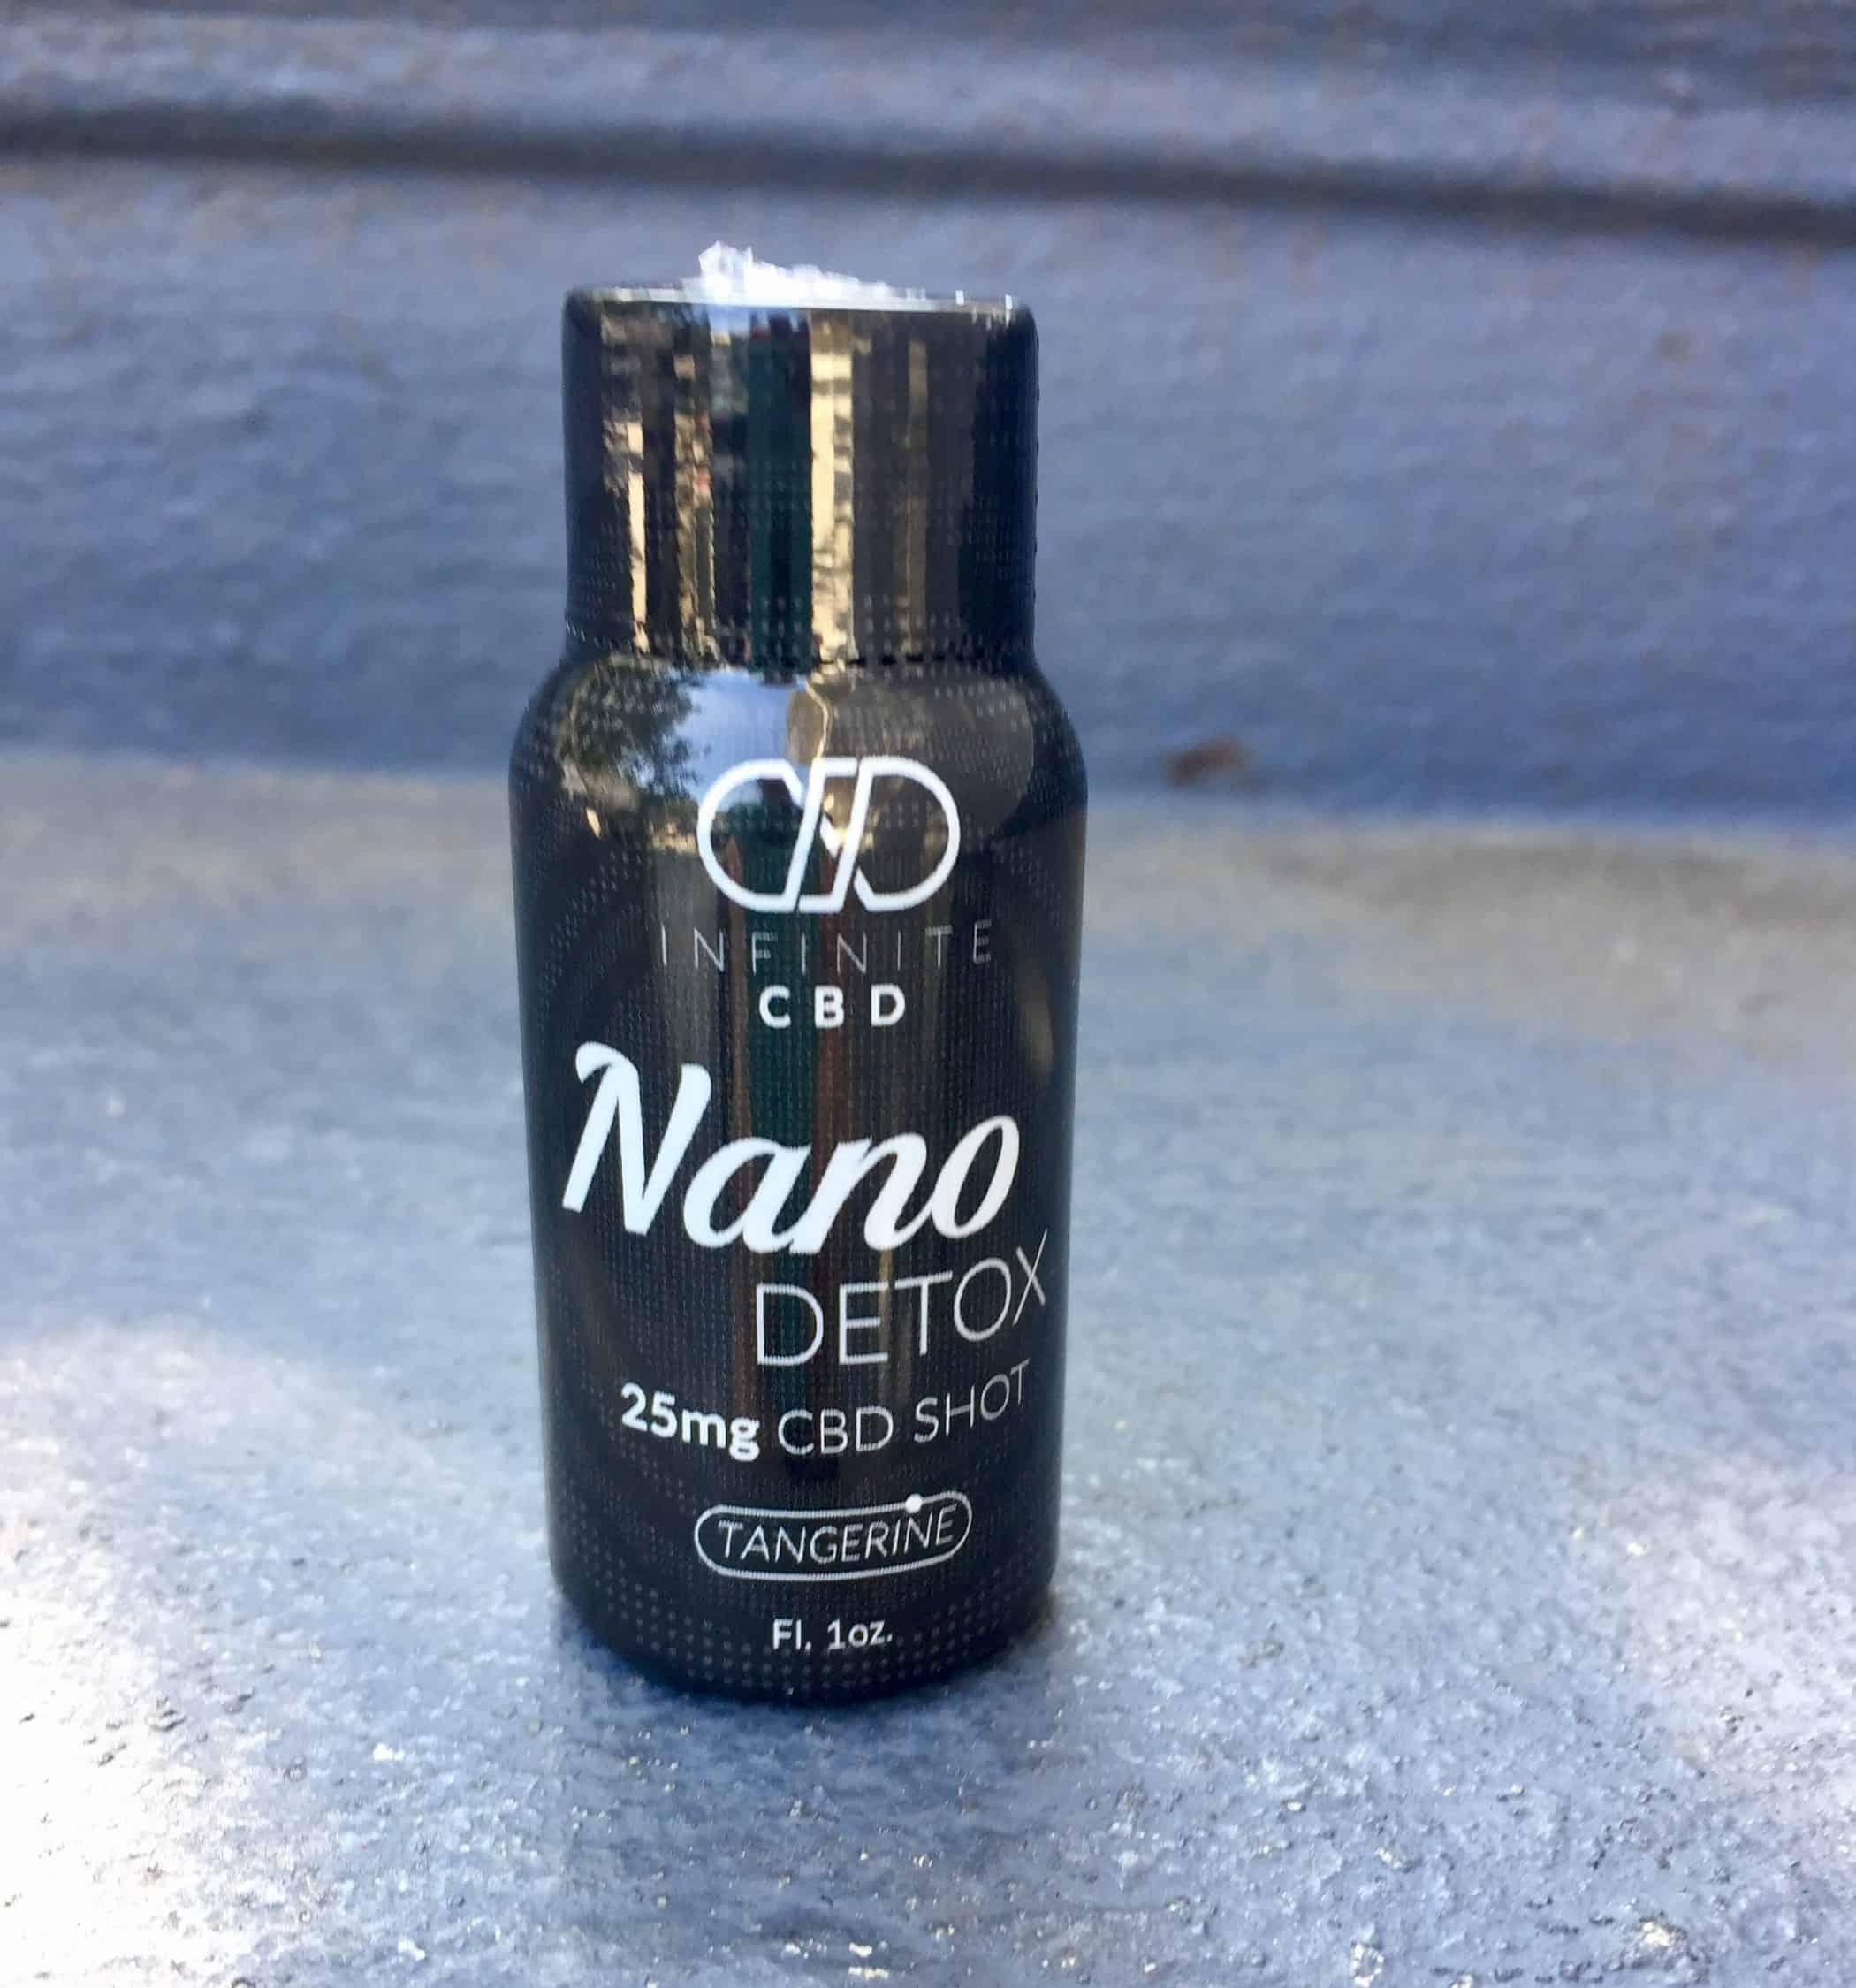 Infinite CBD Review - Save On Cannabis - Nano Shot Detox - Beauty Shot